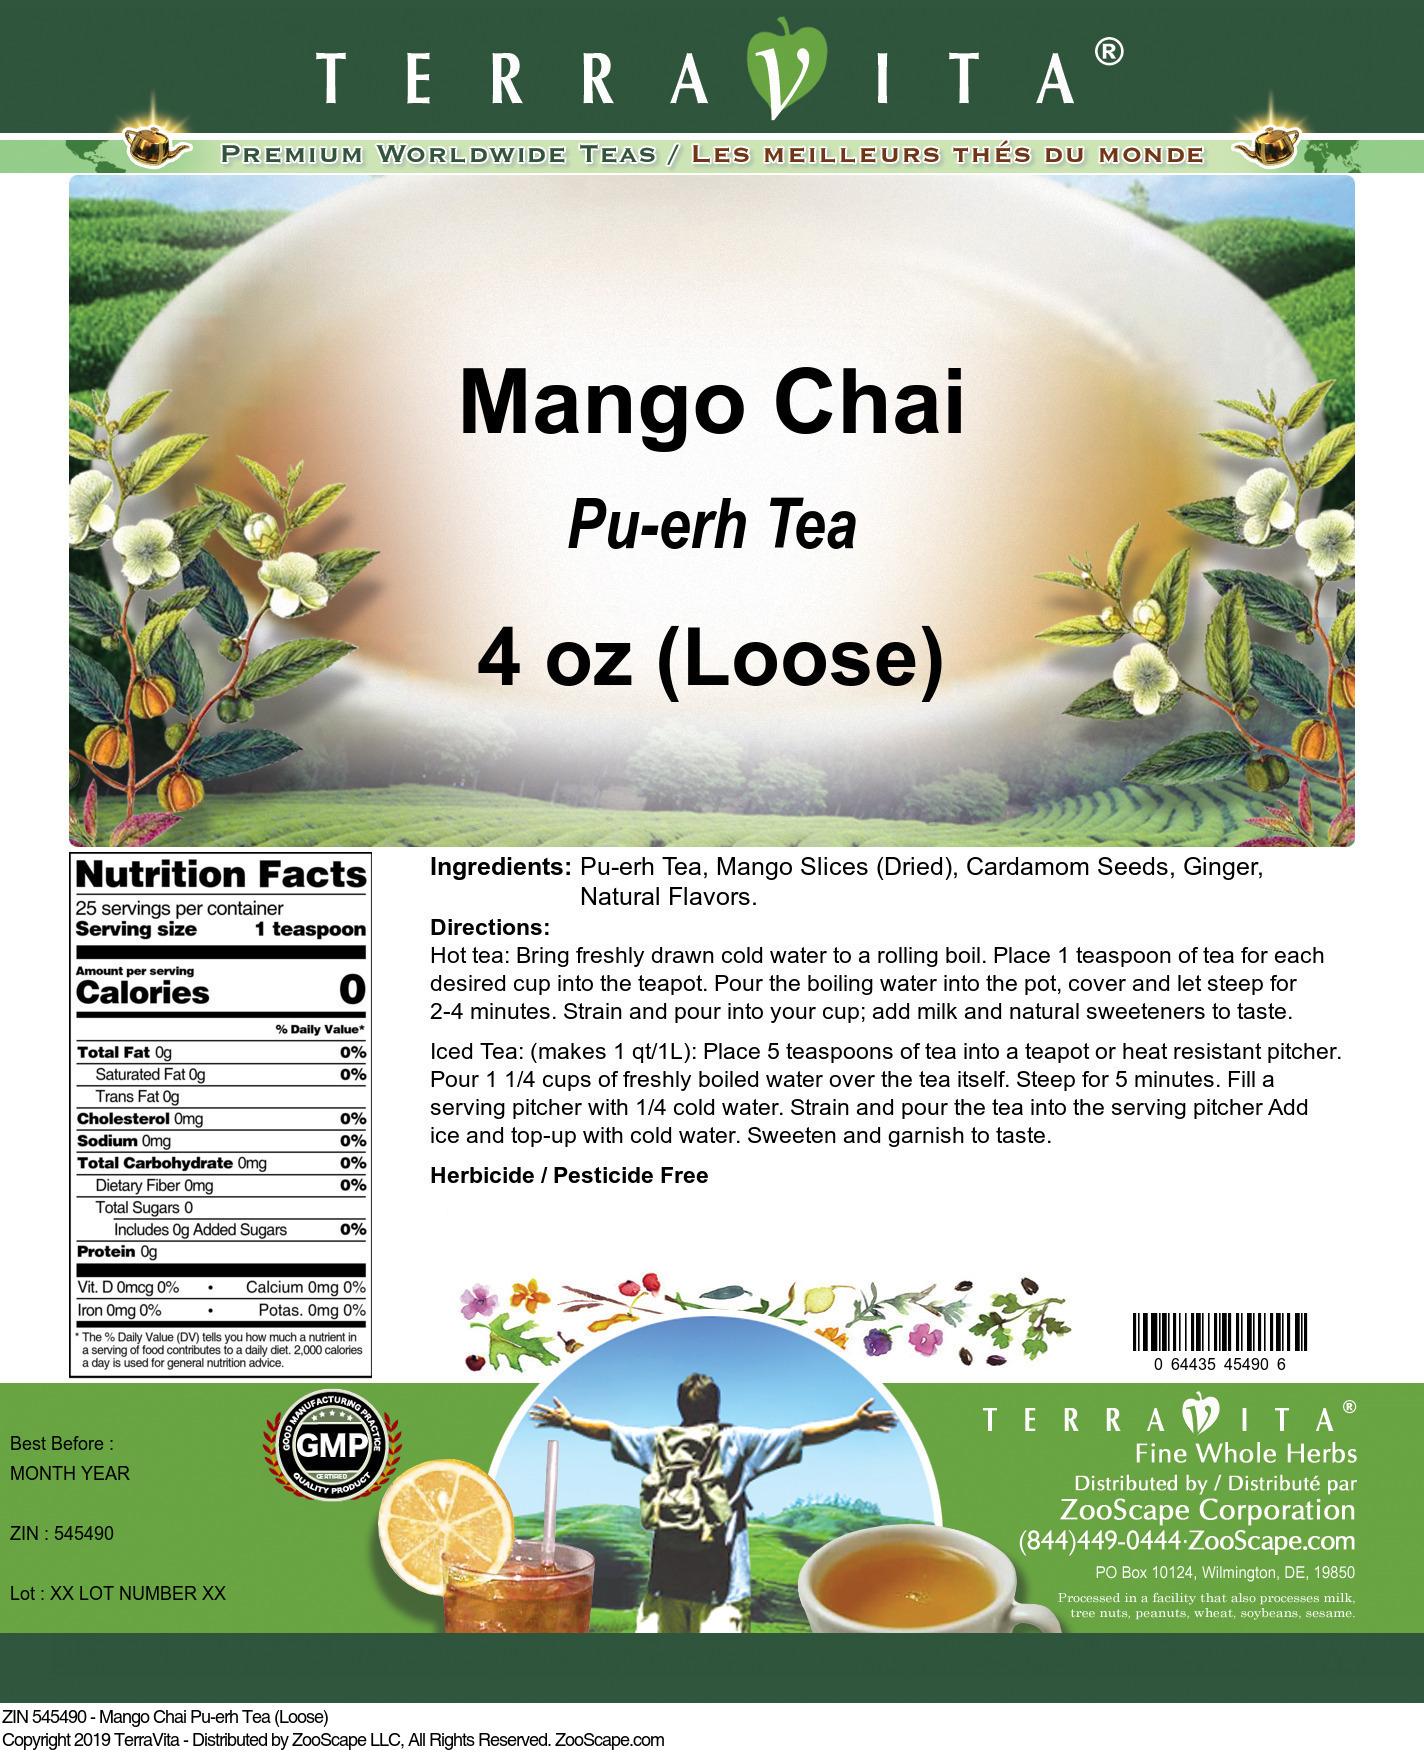 Mango Chai Pu-erh Tea